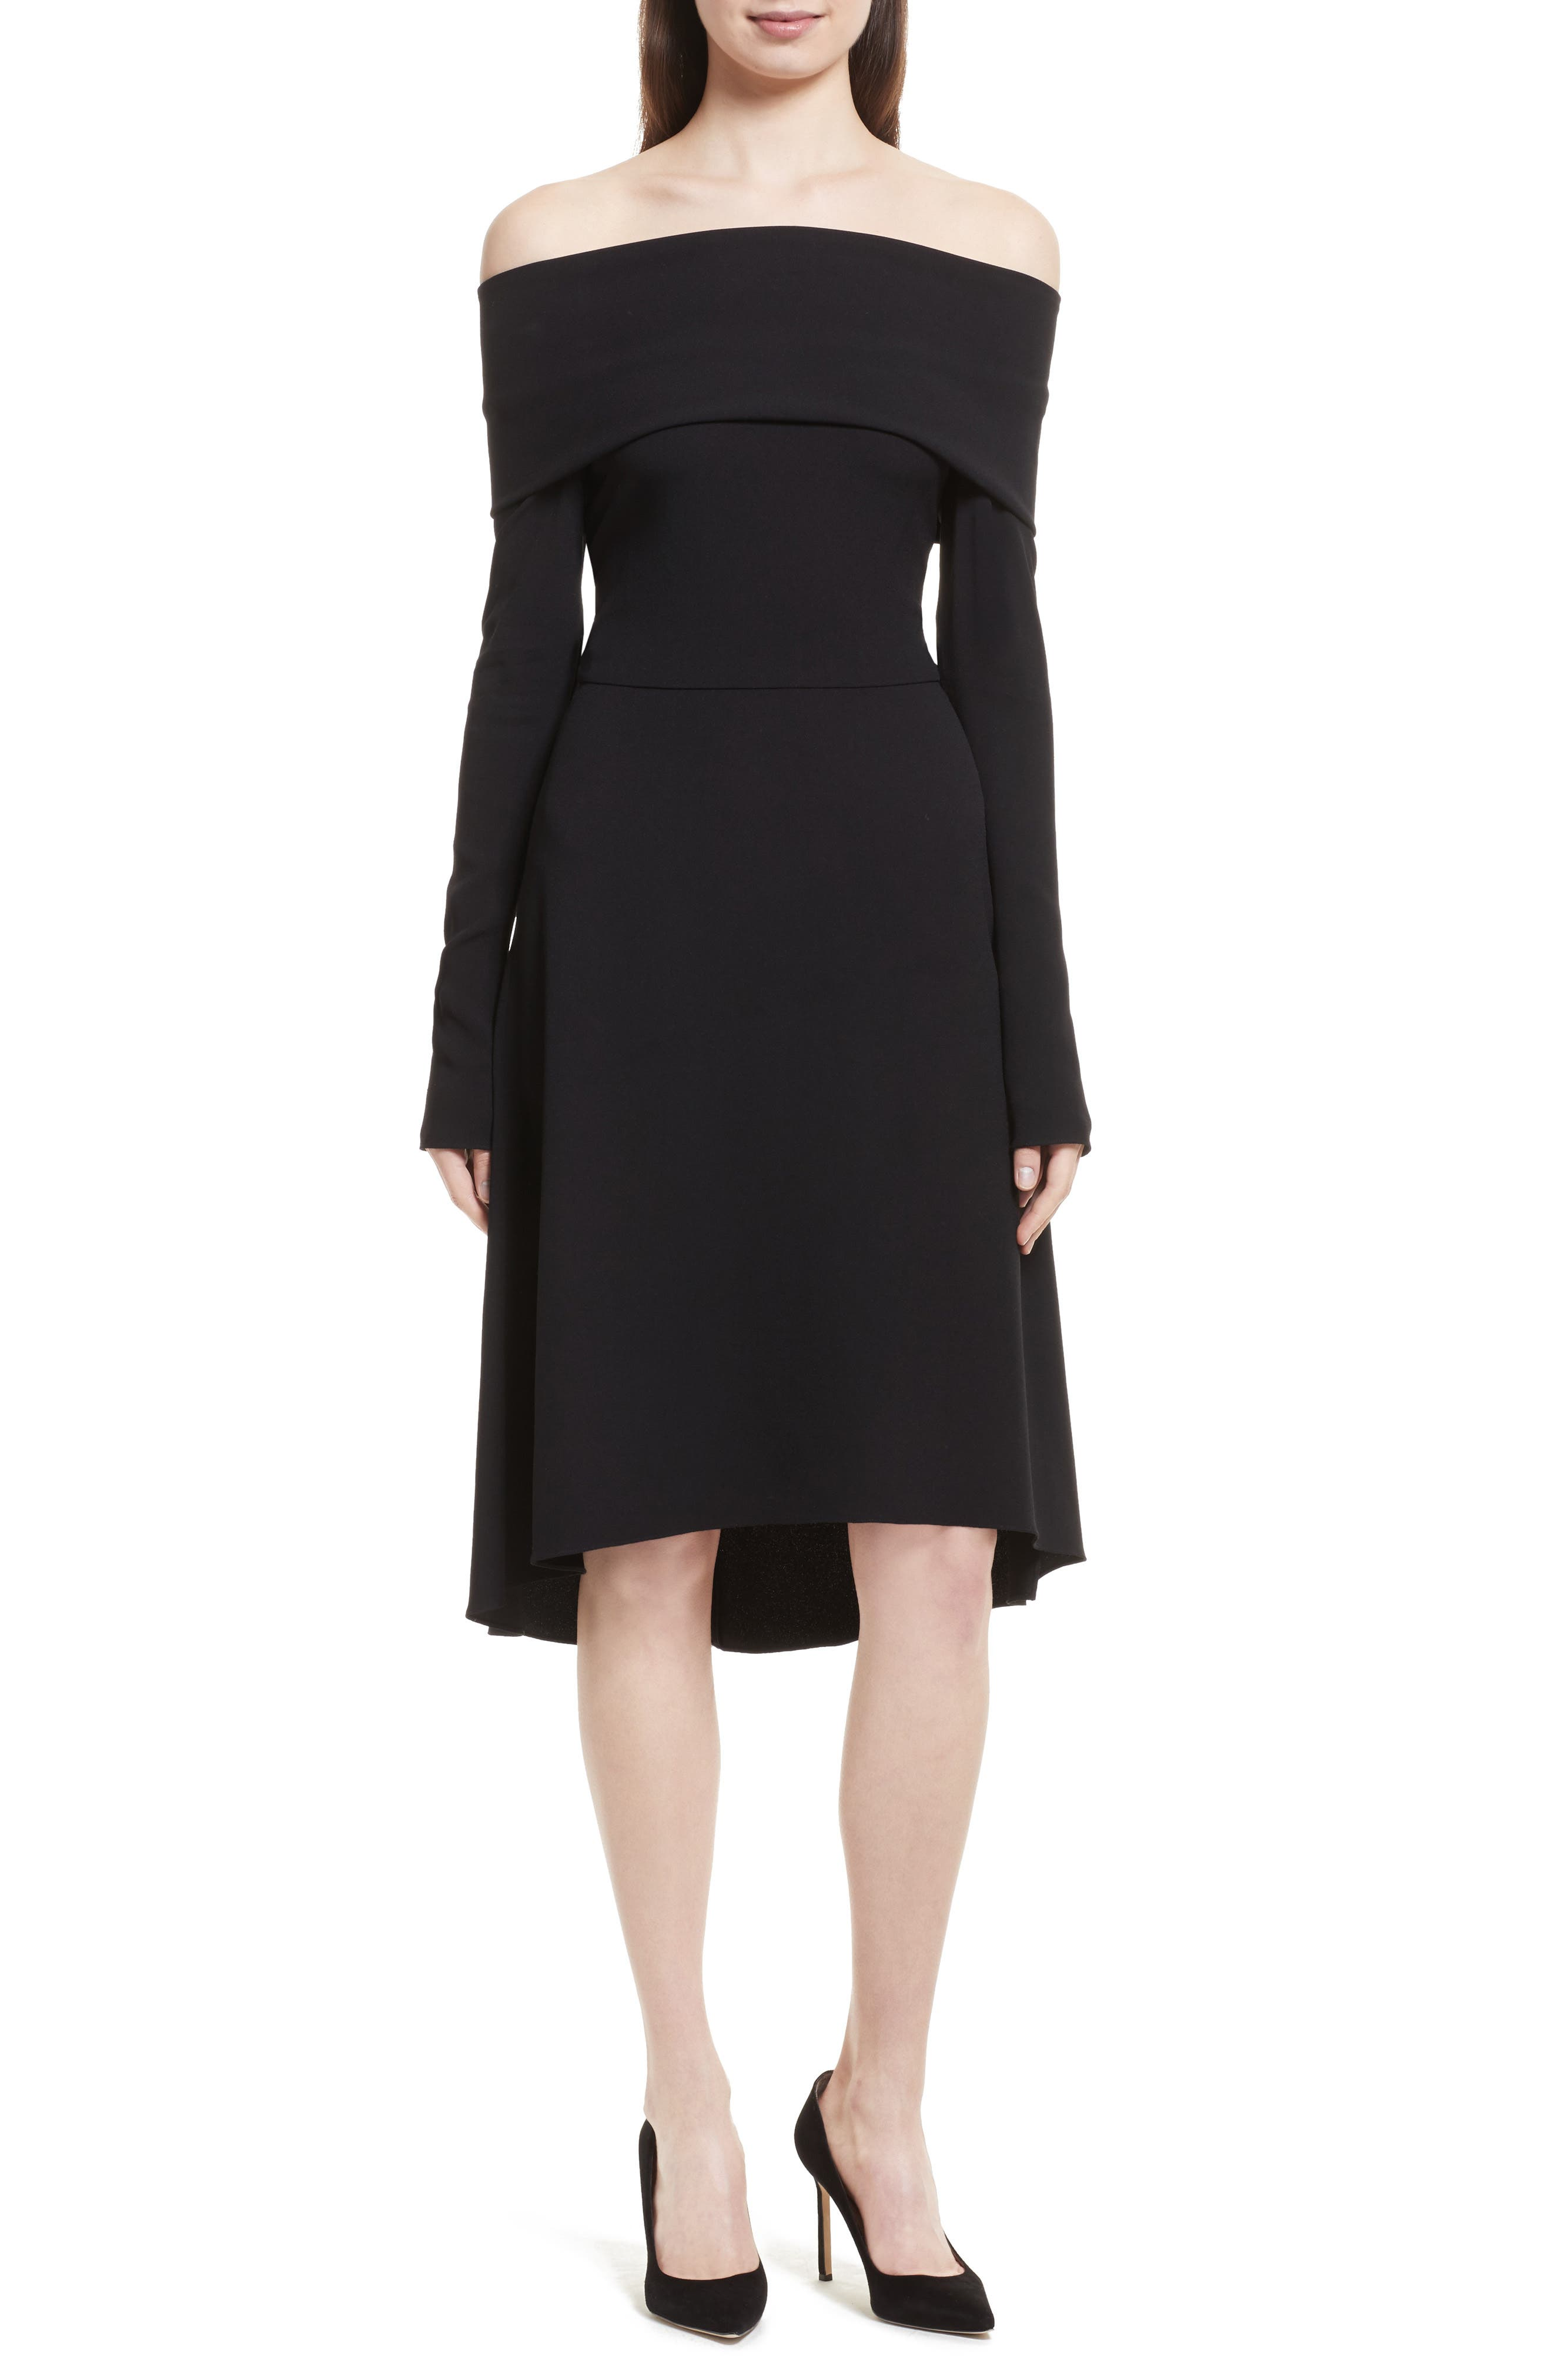 Main Image - Theory Kensington Off the Shoulder Foldover Dress